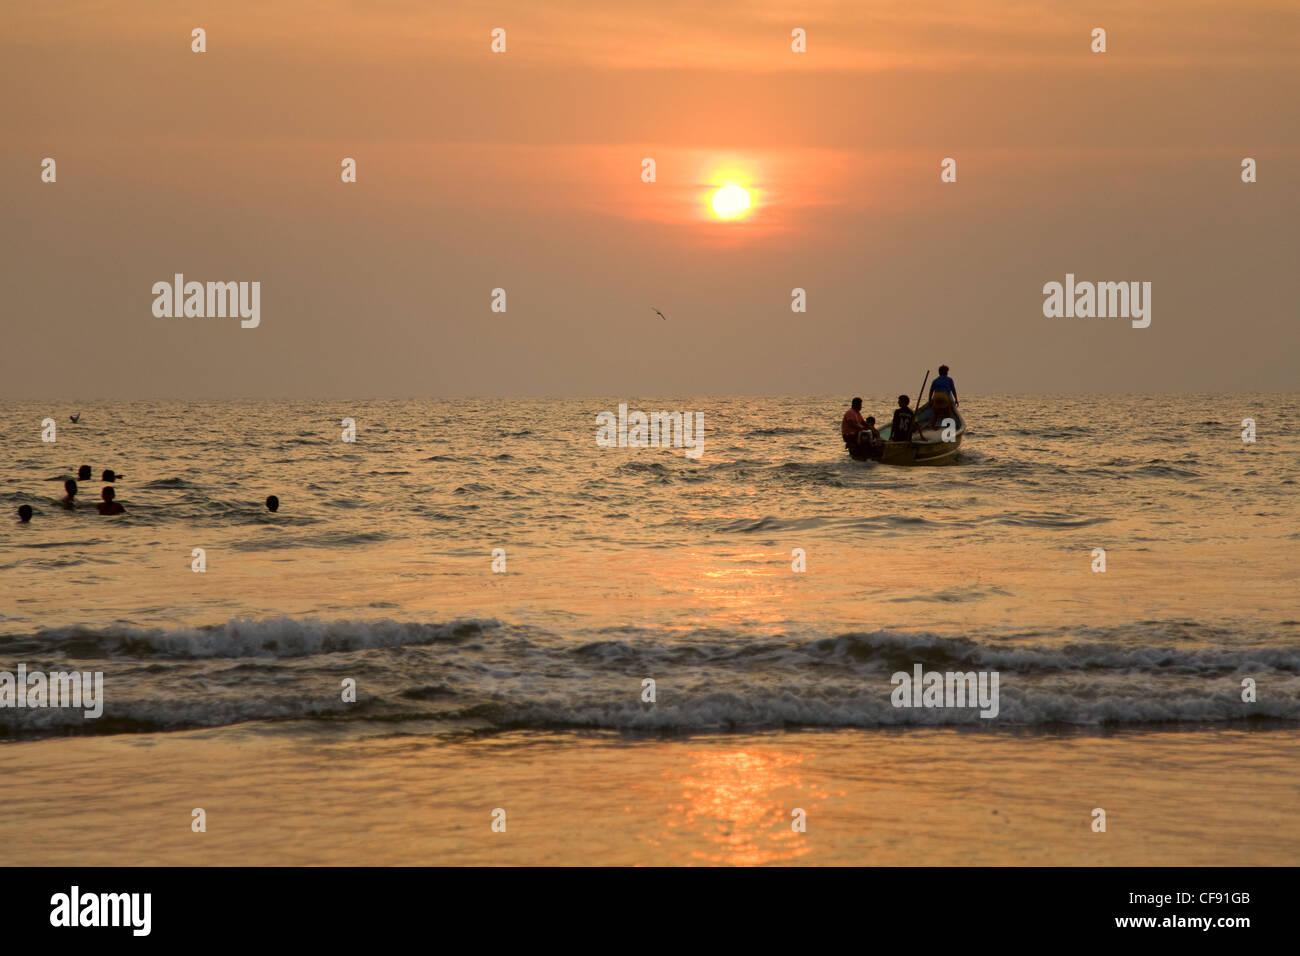 GOA, INDIA - 19 NOV 2011: indian boat and swimming children at sunset in the seaon Arambol beach in Goa Stock Photo